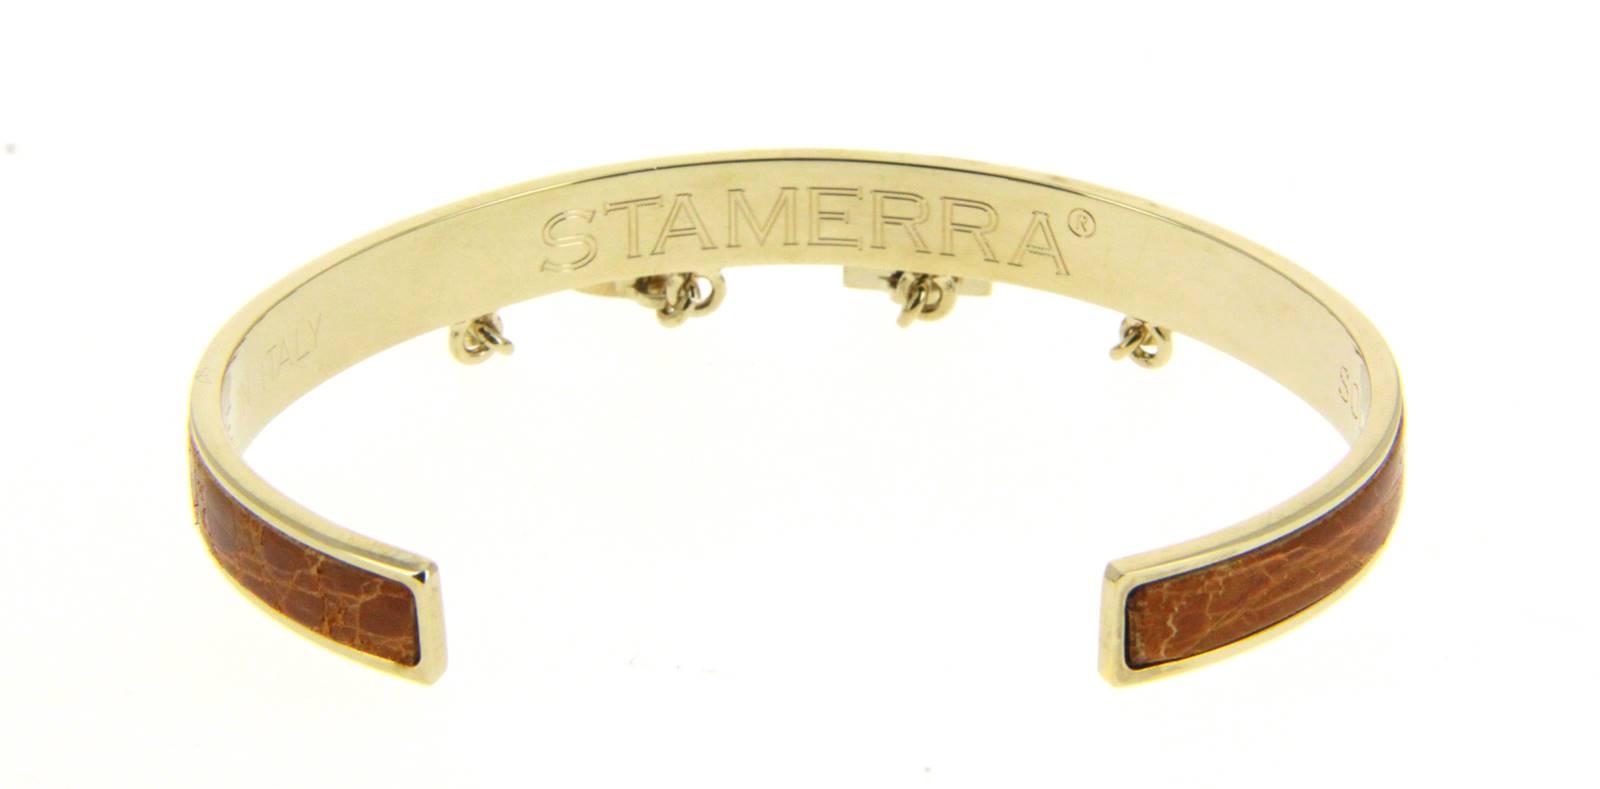 Stamerra Armband VERO GENUINE CROCO GOLD MIELE